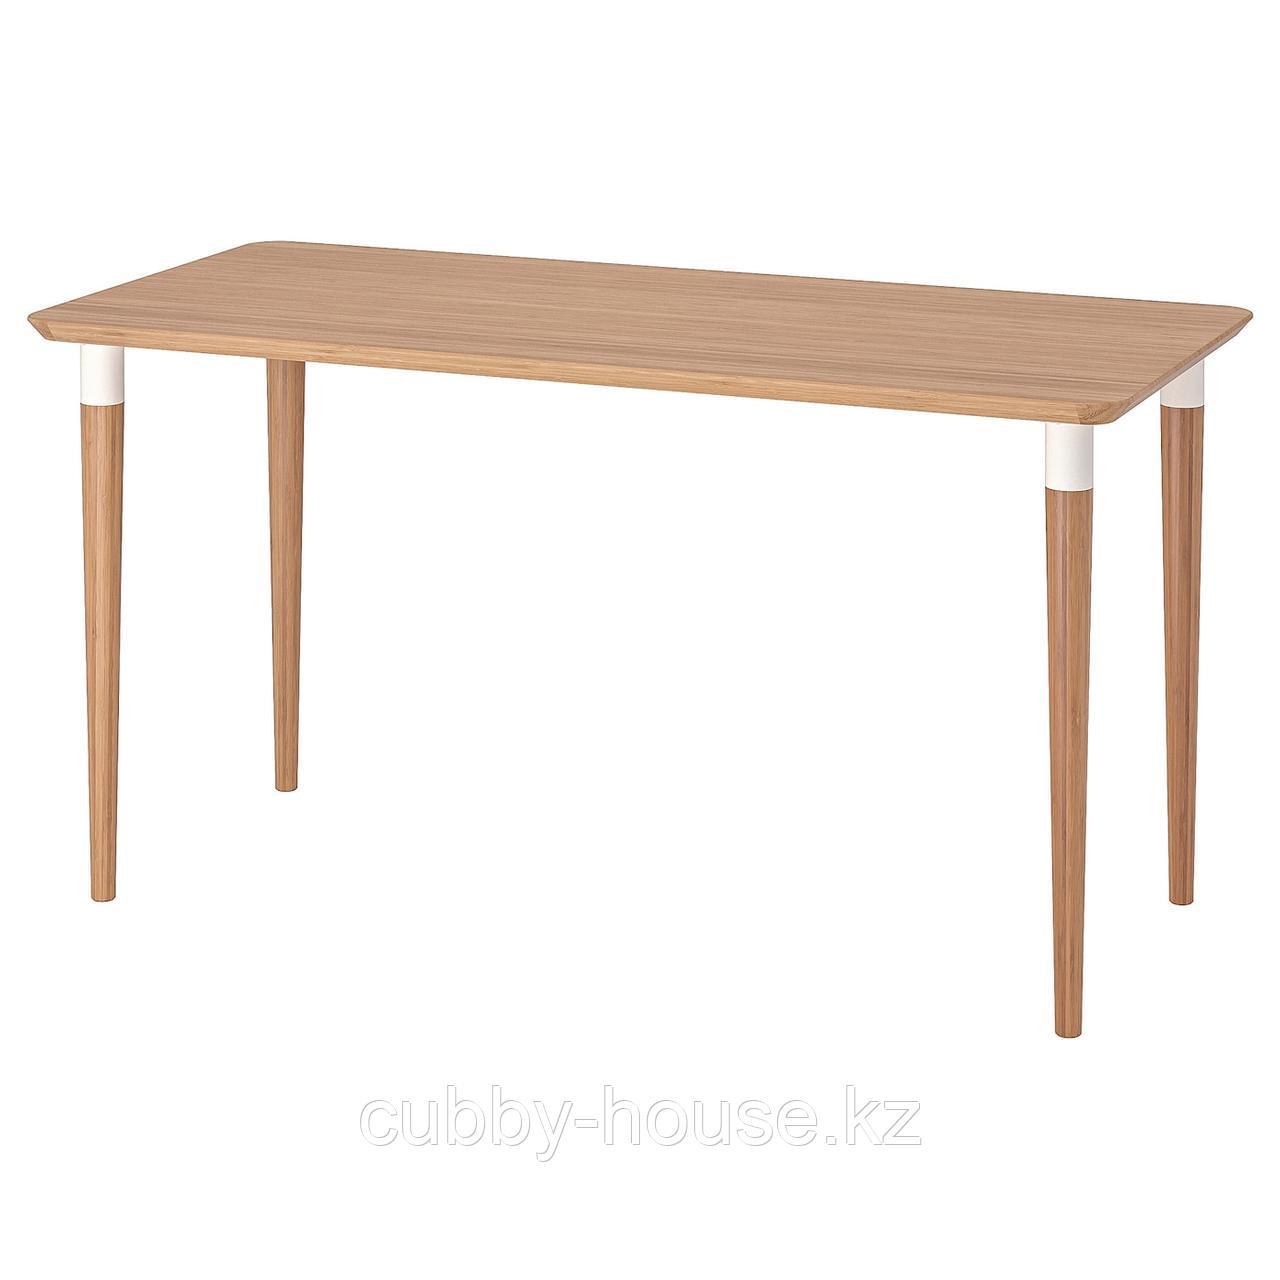 ХИЛВЕР Стол, бамбук, 140x65 см